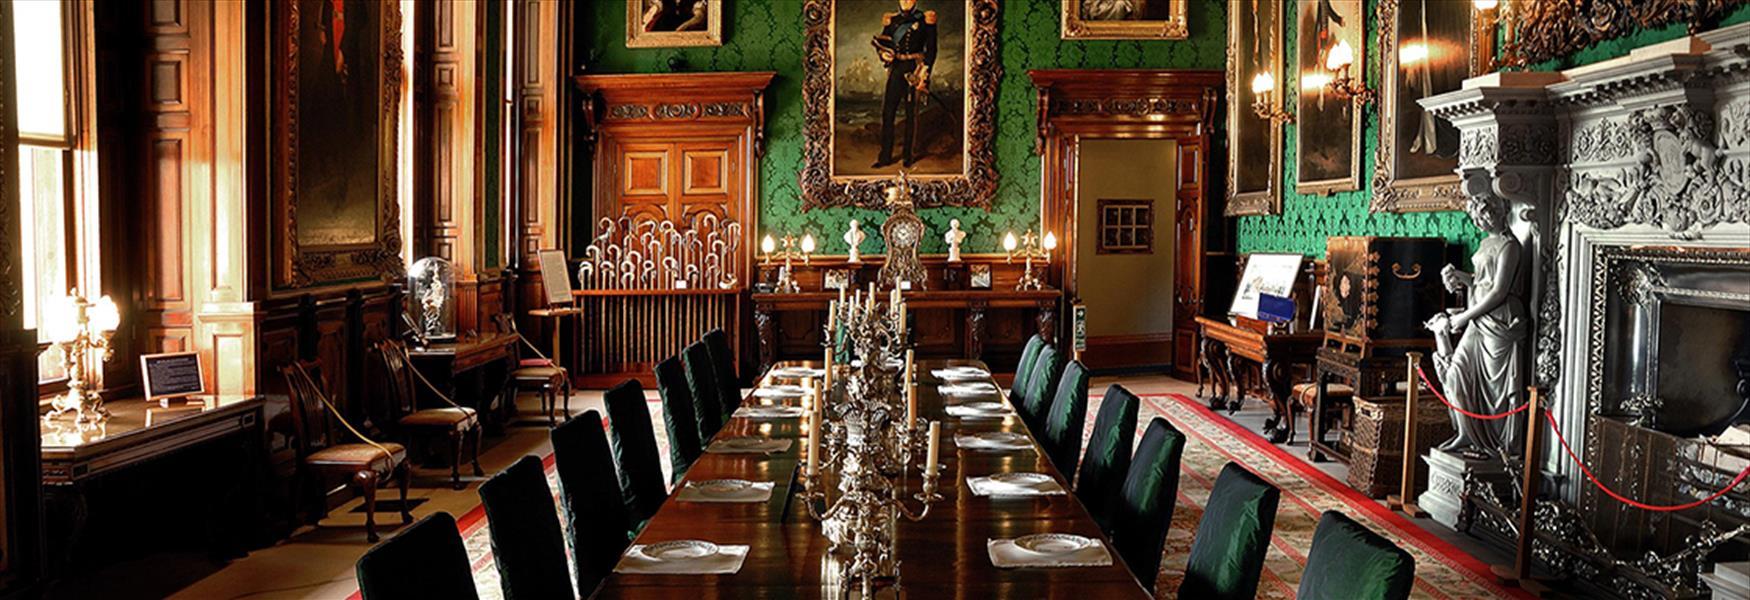 Alnwick Castle Dining Room